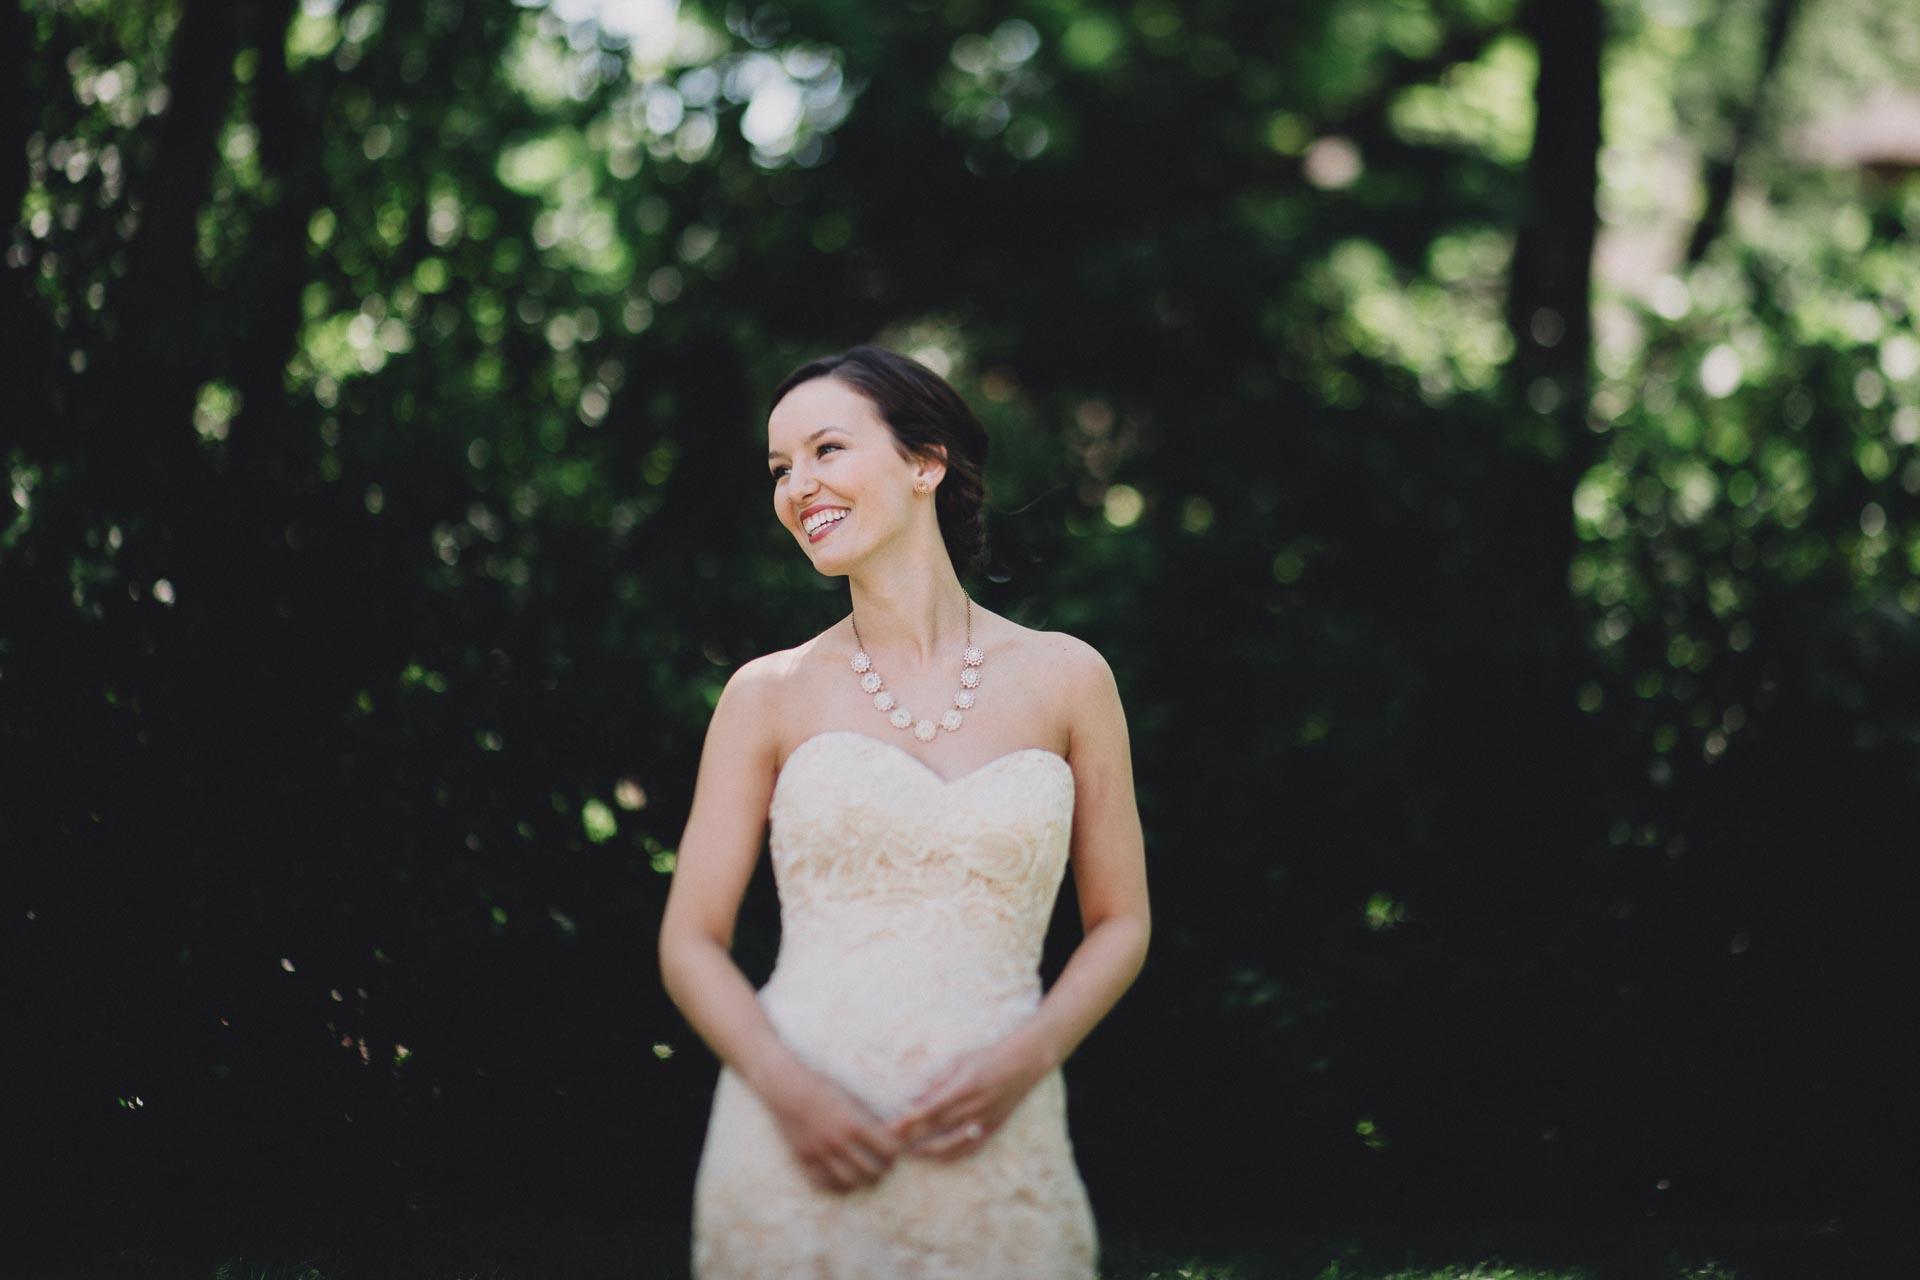 Julia-Michael-Cincinnati-Music-Hall-Wedding-027@2x.jpg